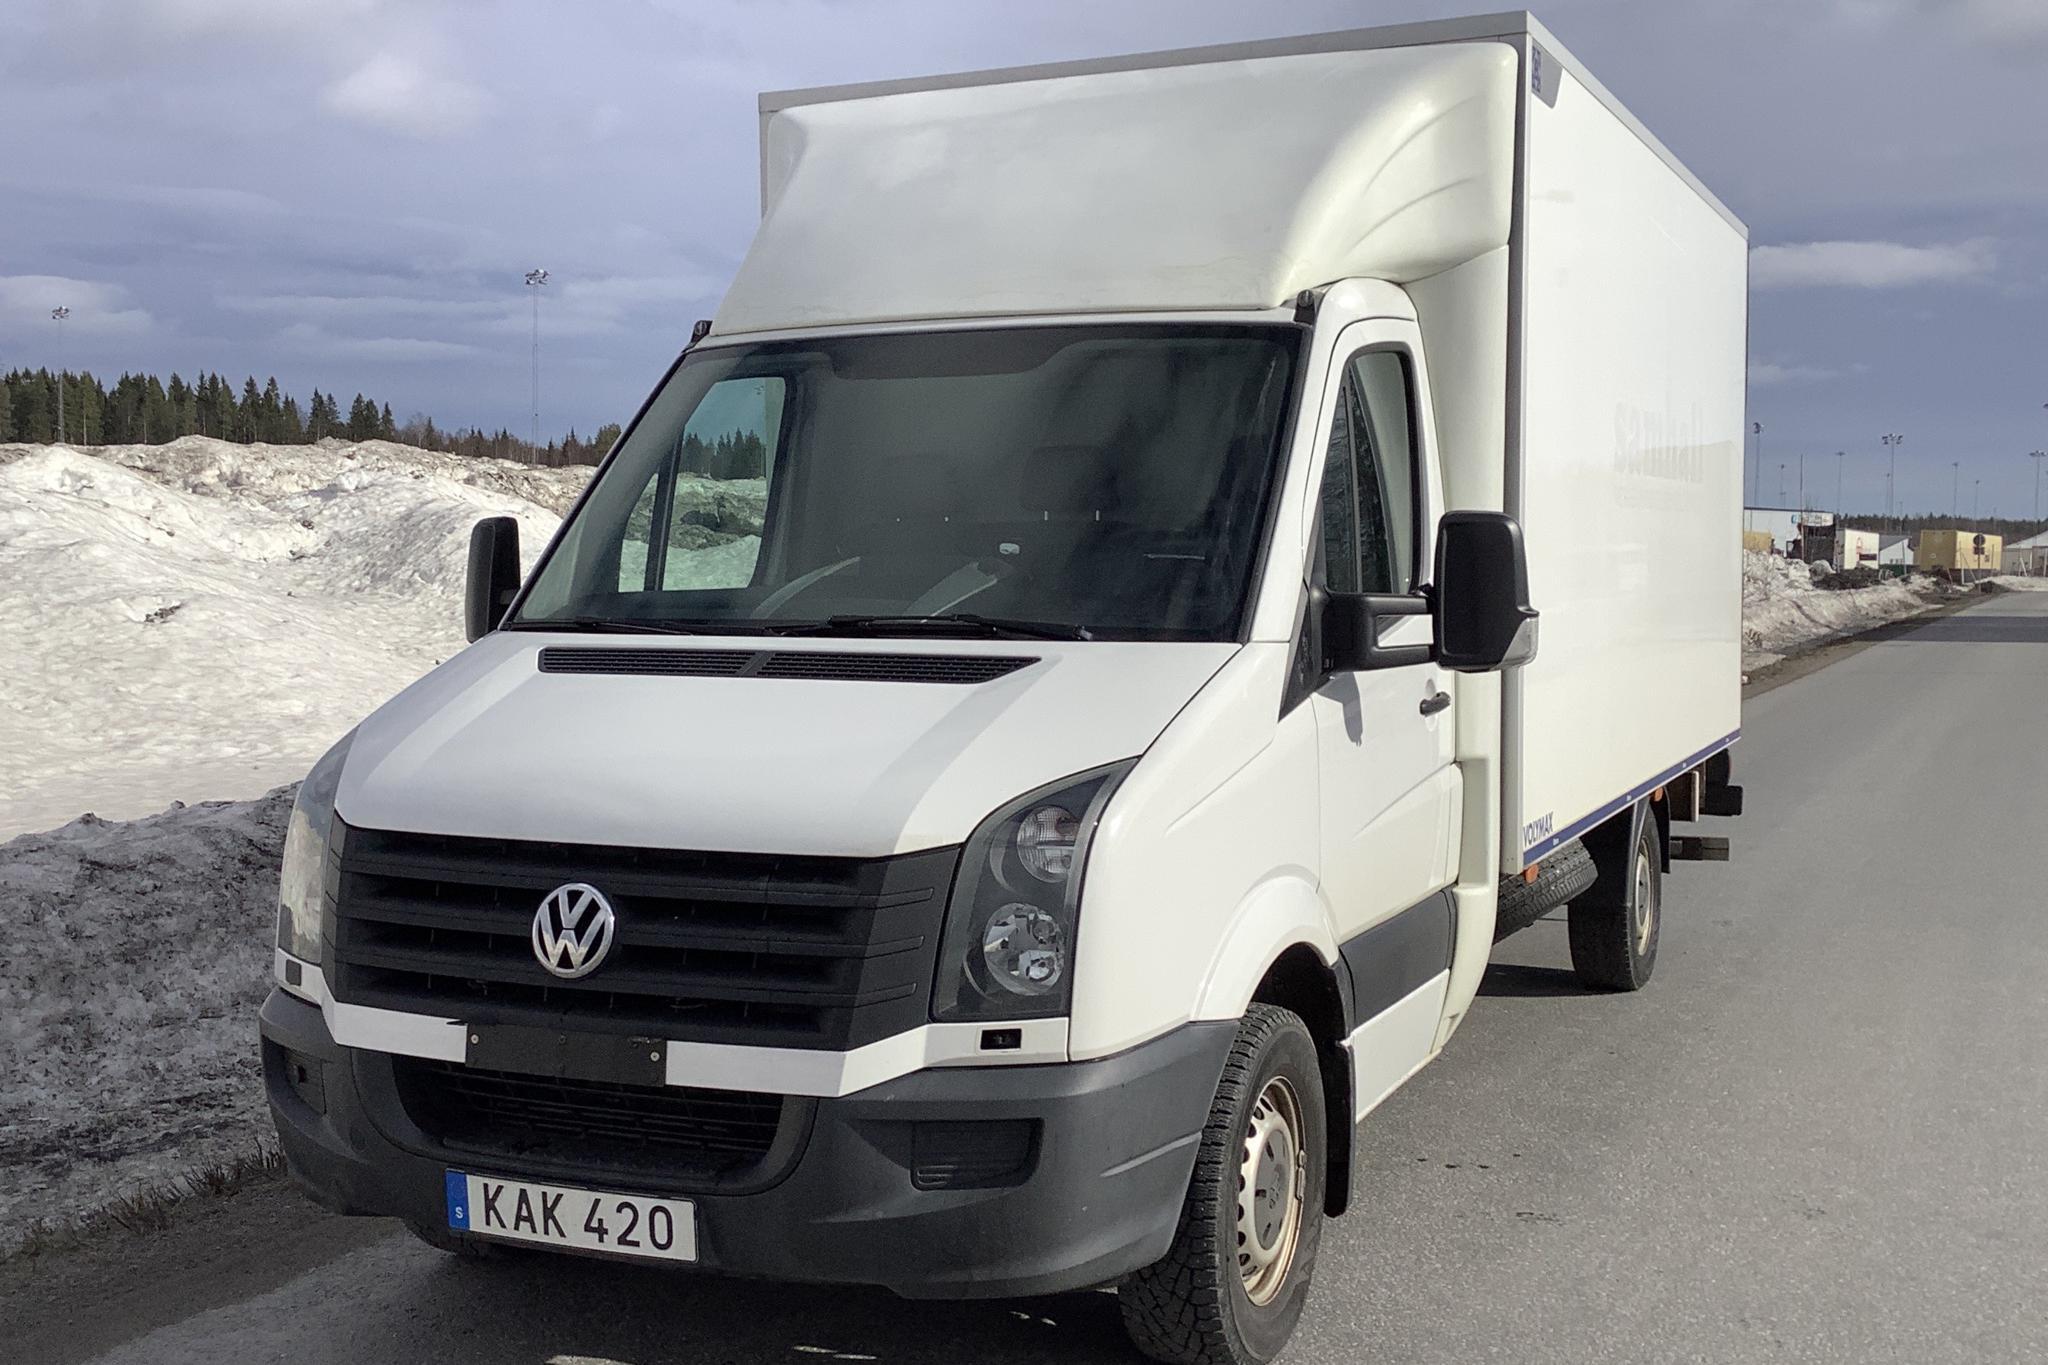 VW Crafter 35 2.0 TDI Volymskåp (163hk) - 119 220 km - Manual - white - 2016